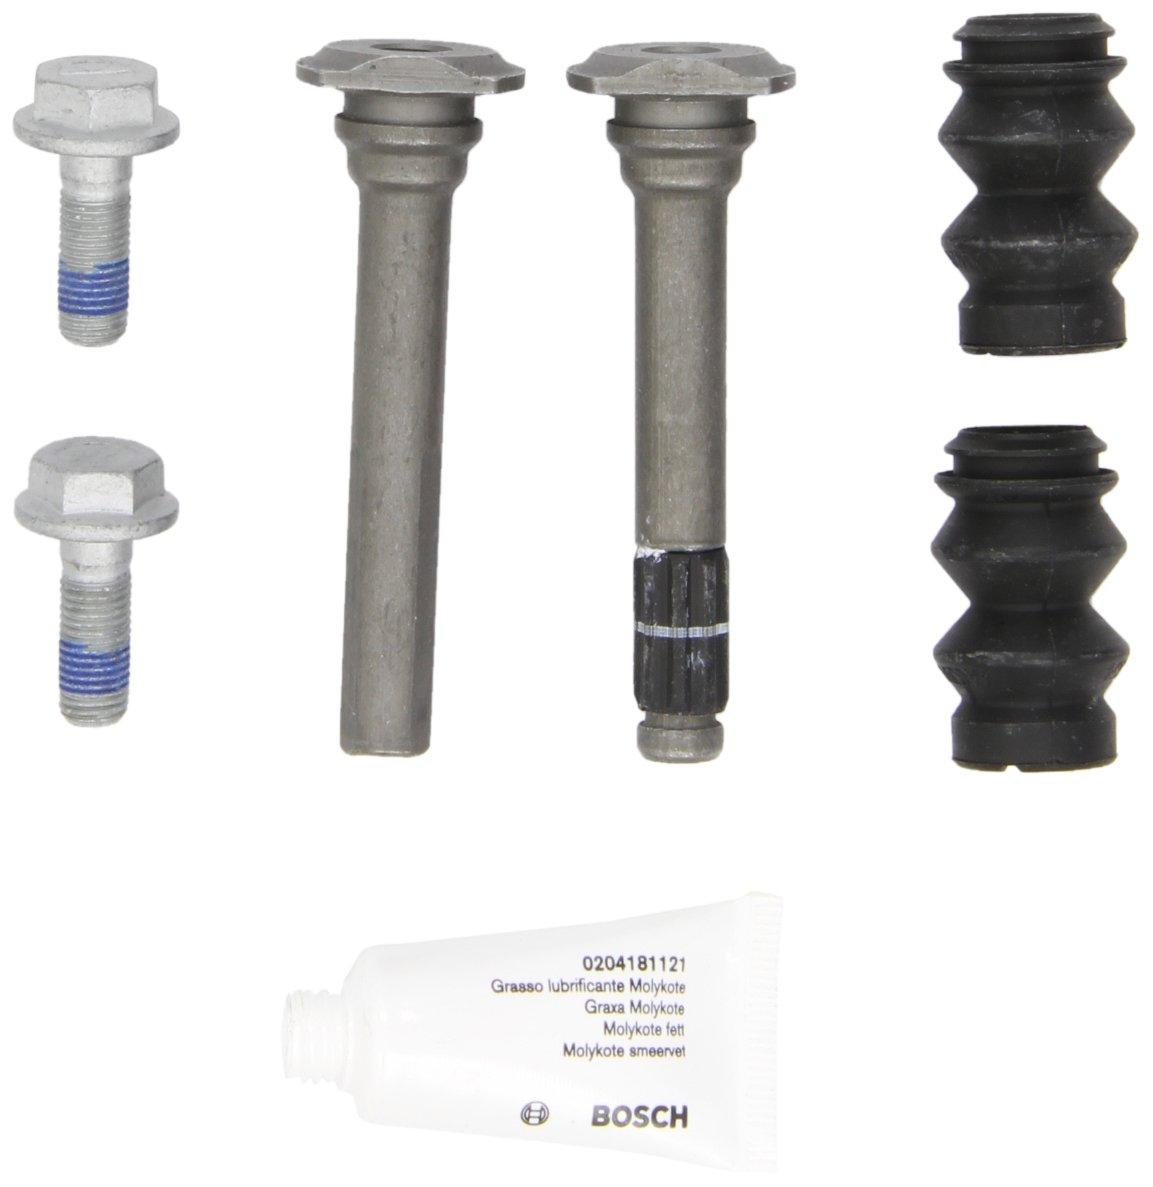 Bosch 0204104308 Guide Sleeve 0 204 104 308